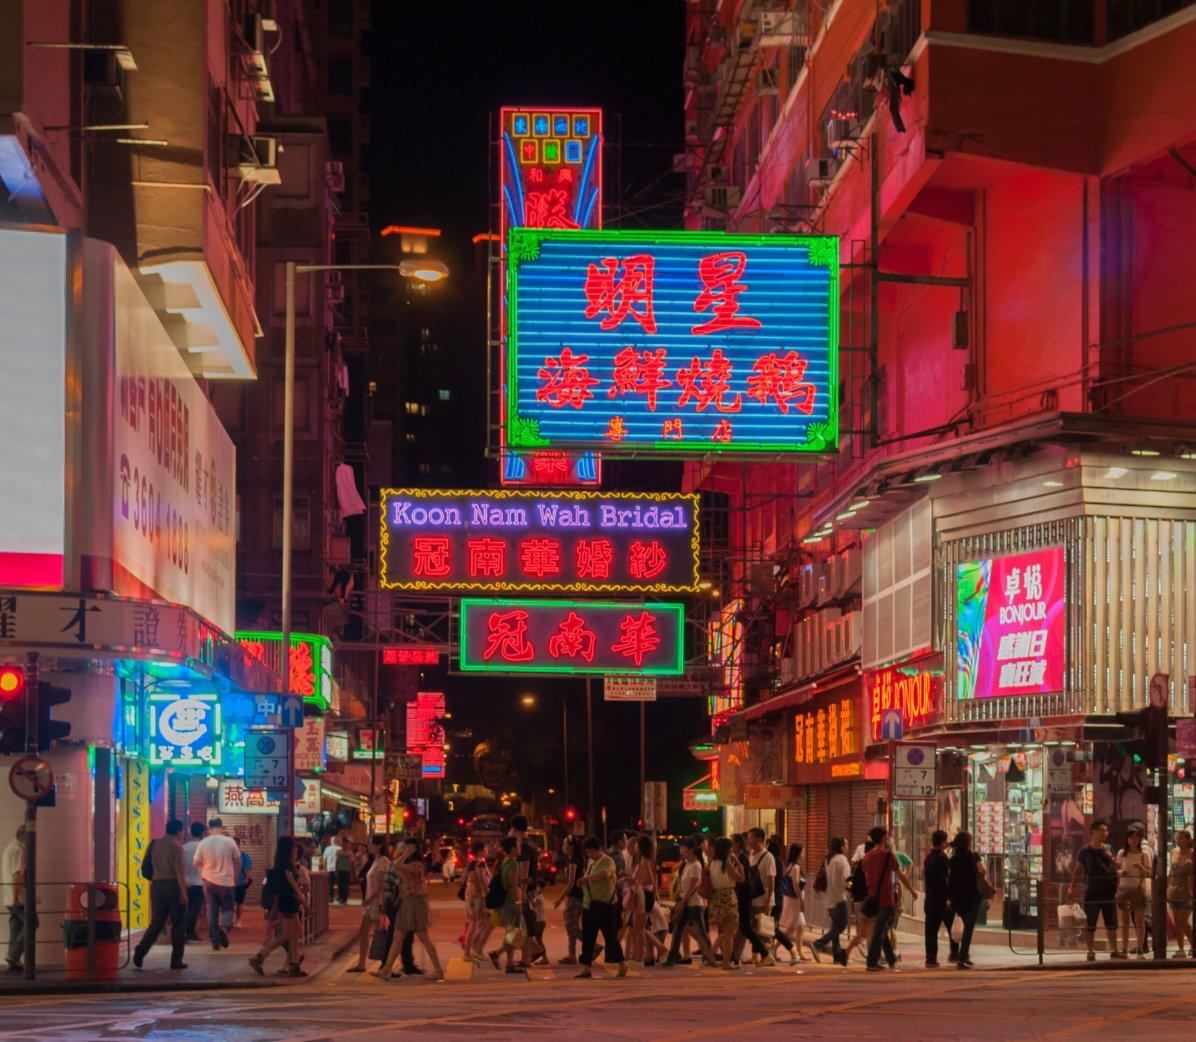 Hong Kong Travel Blog - This is a copyright free photo